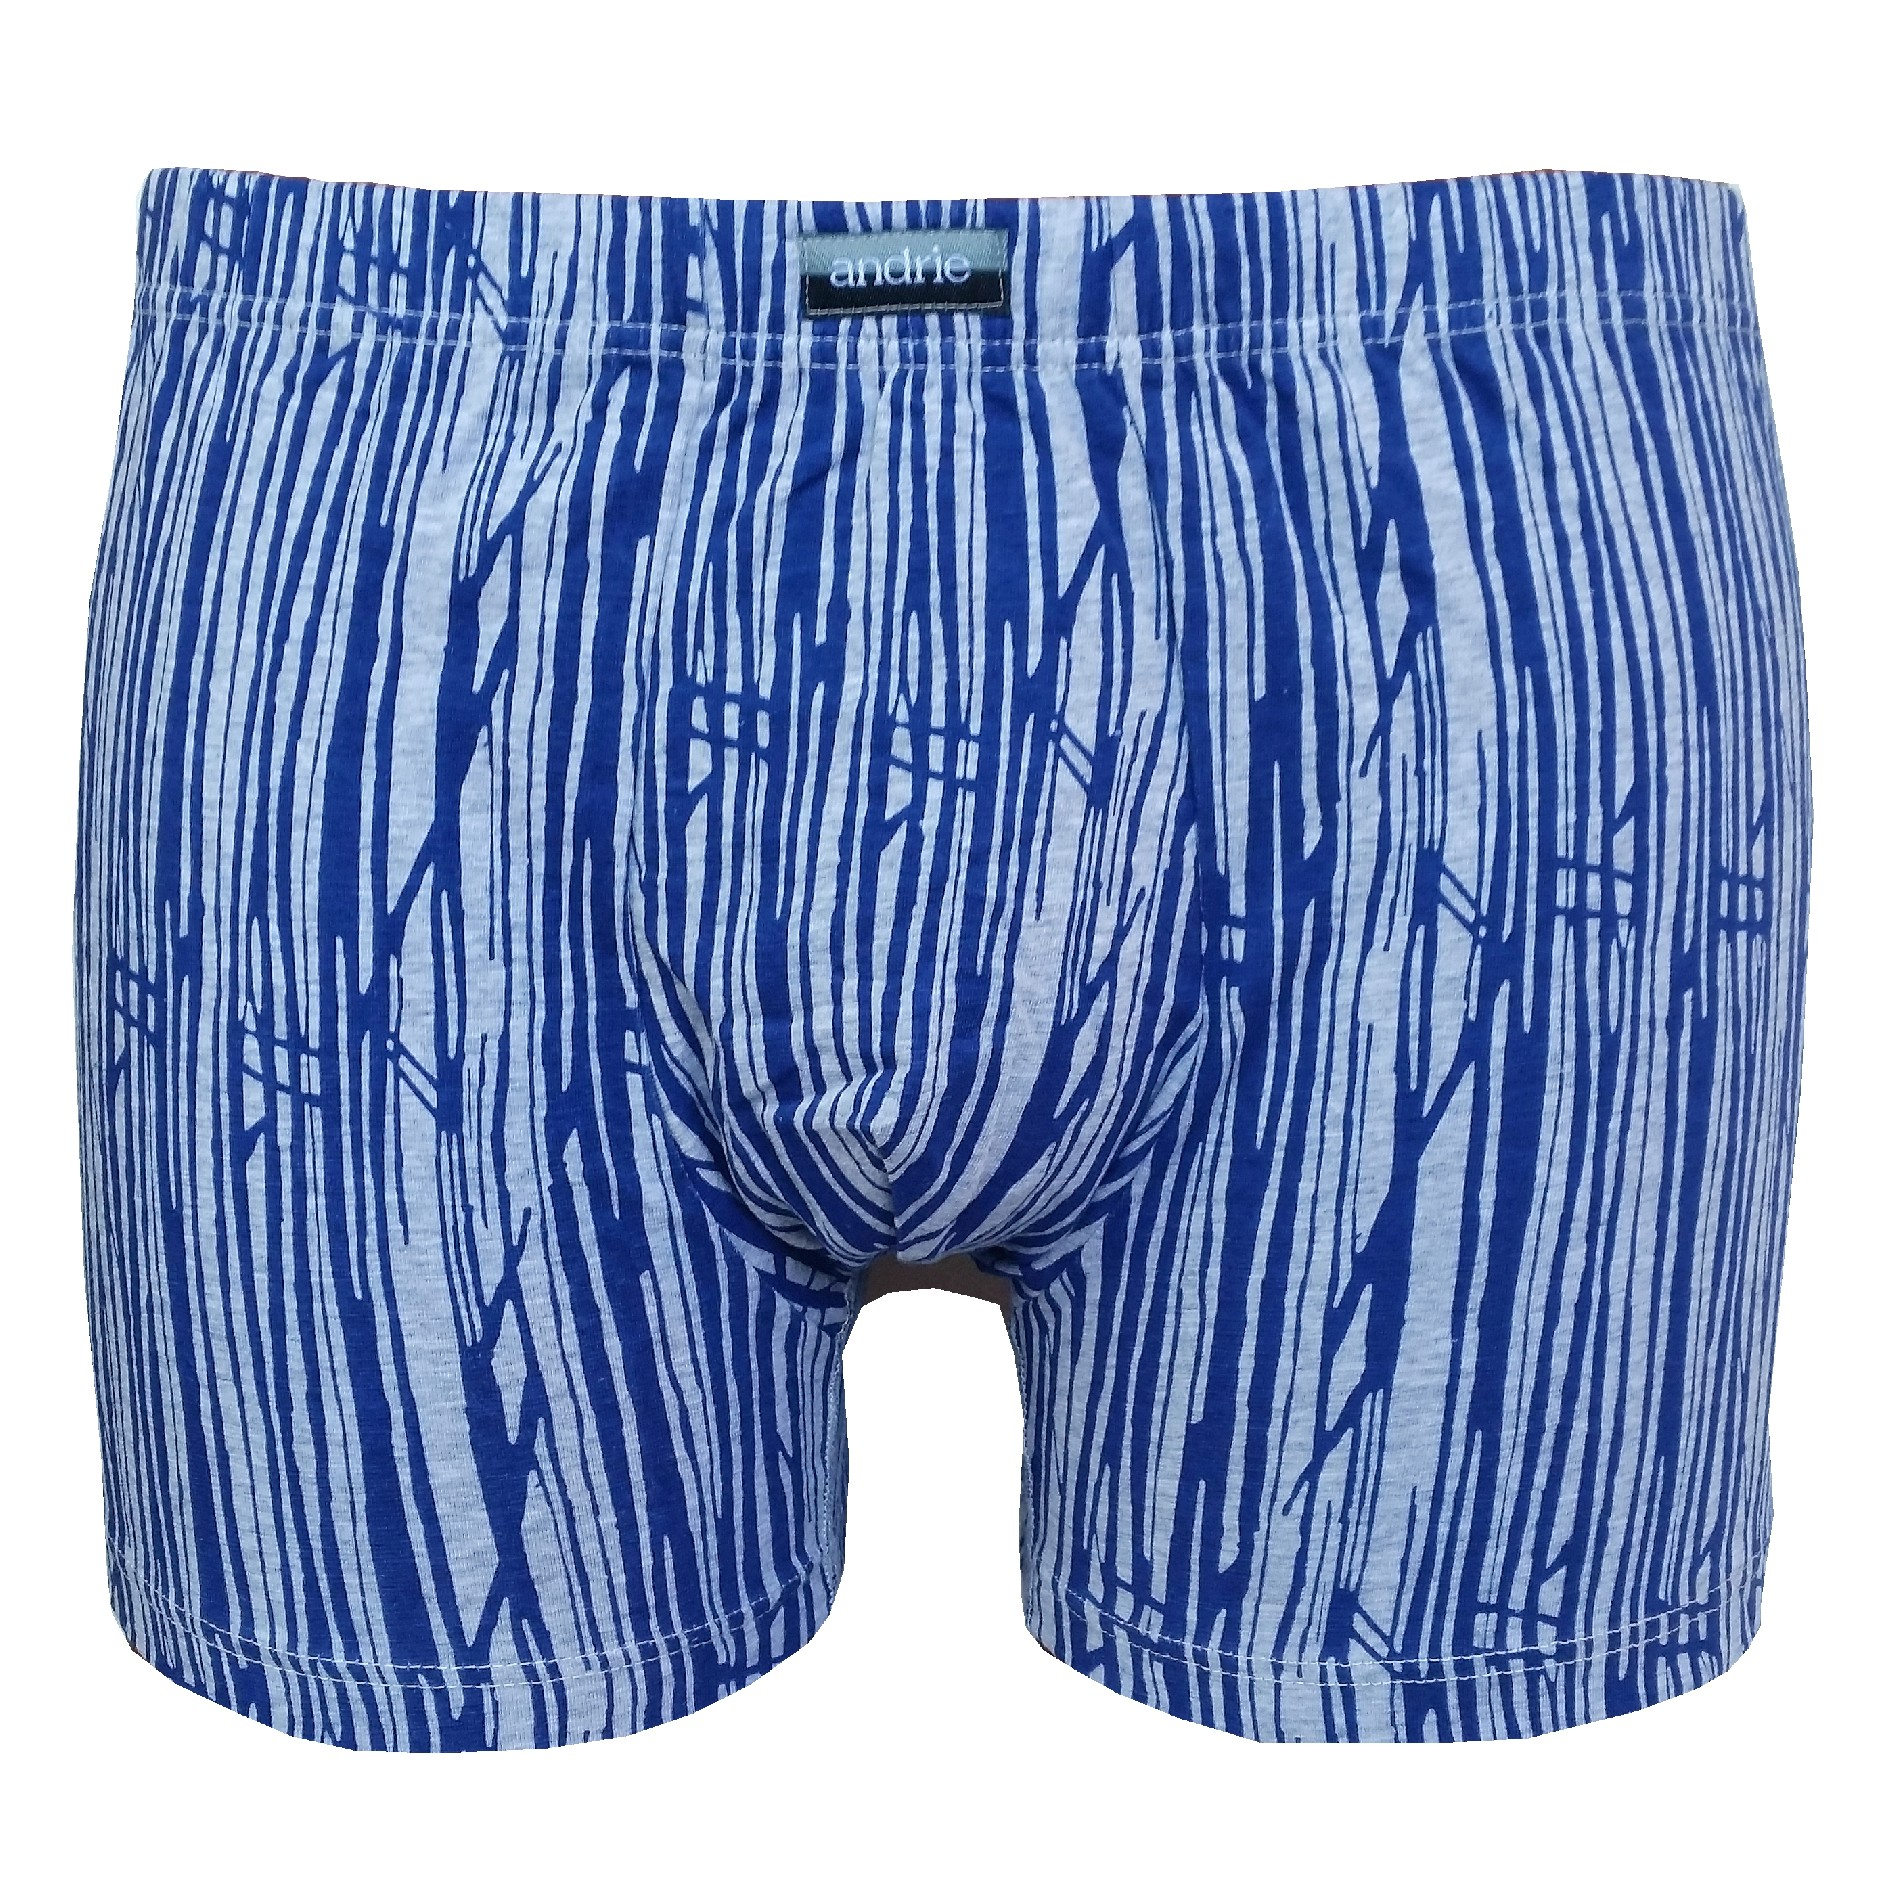 Andrie PS 5200 pánské boxerky, modrá tmavá, M